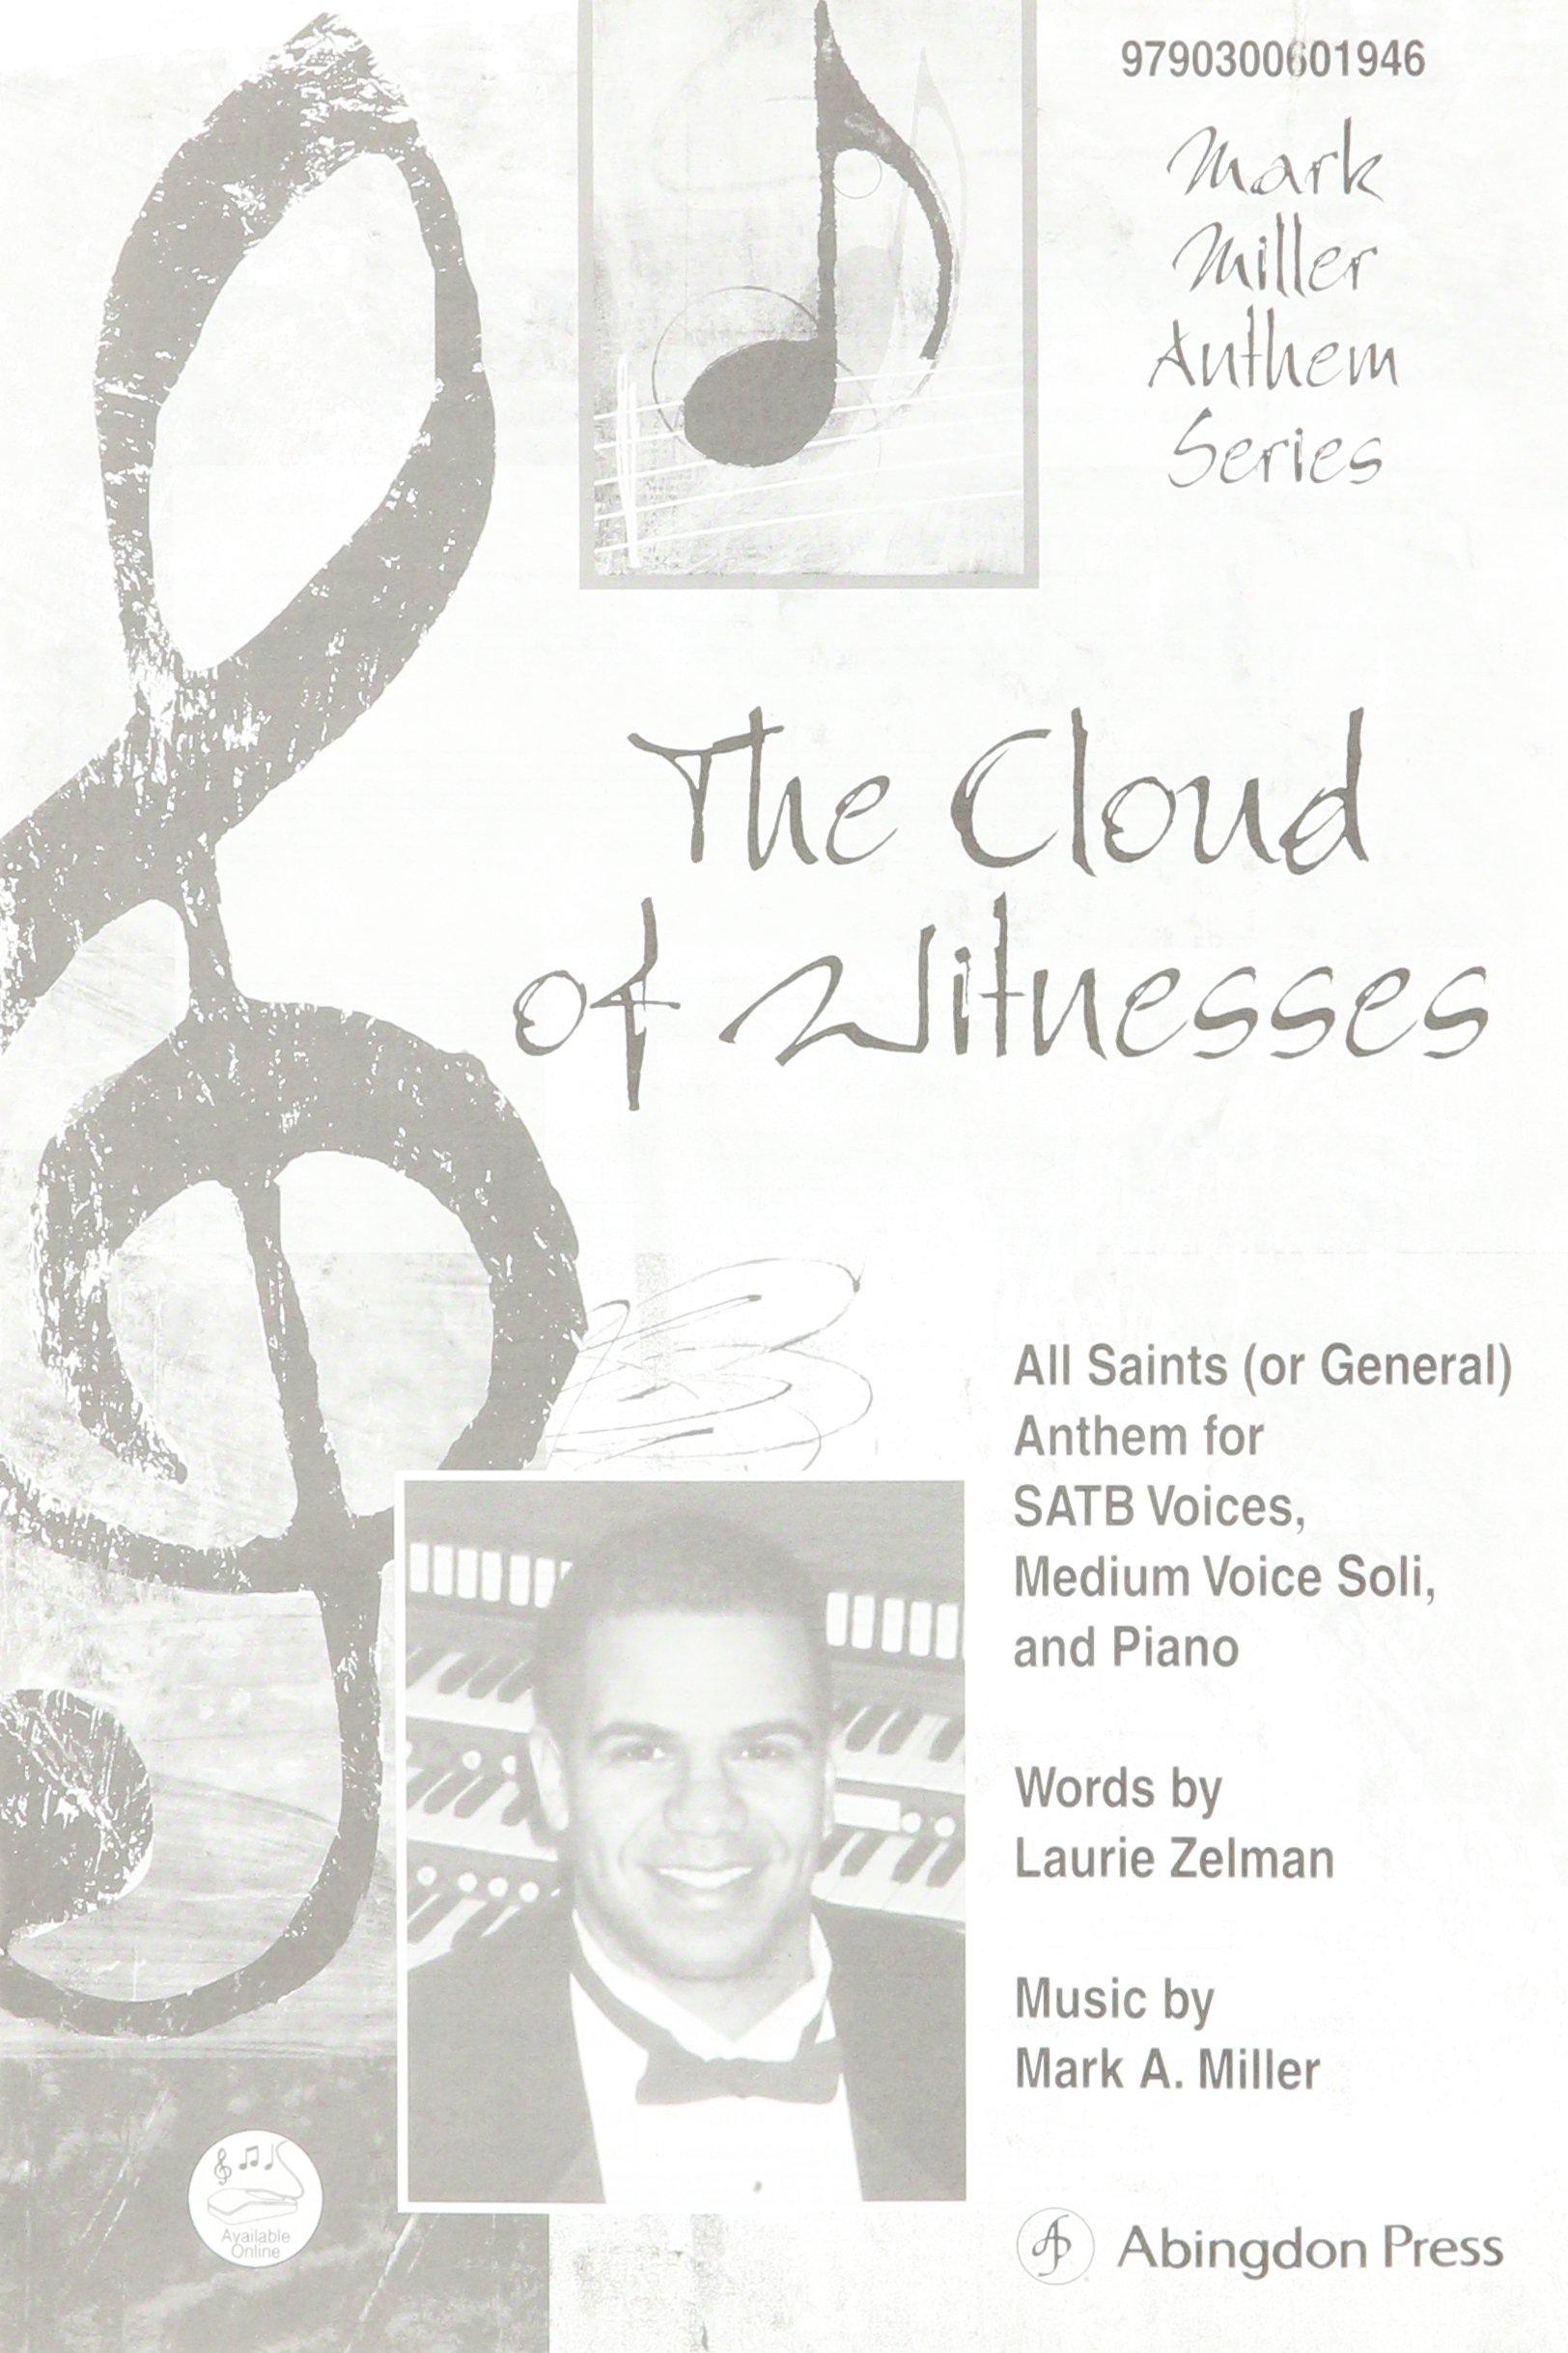 Download Cloud of Witnesses Anthem pdf